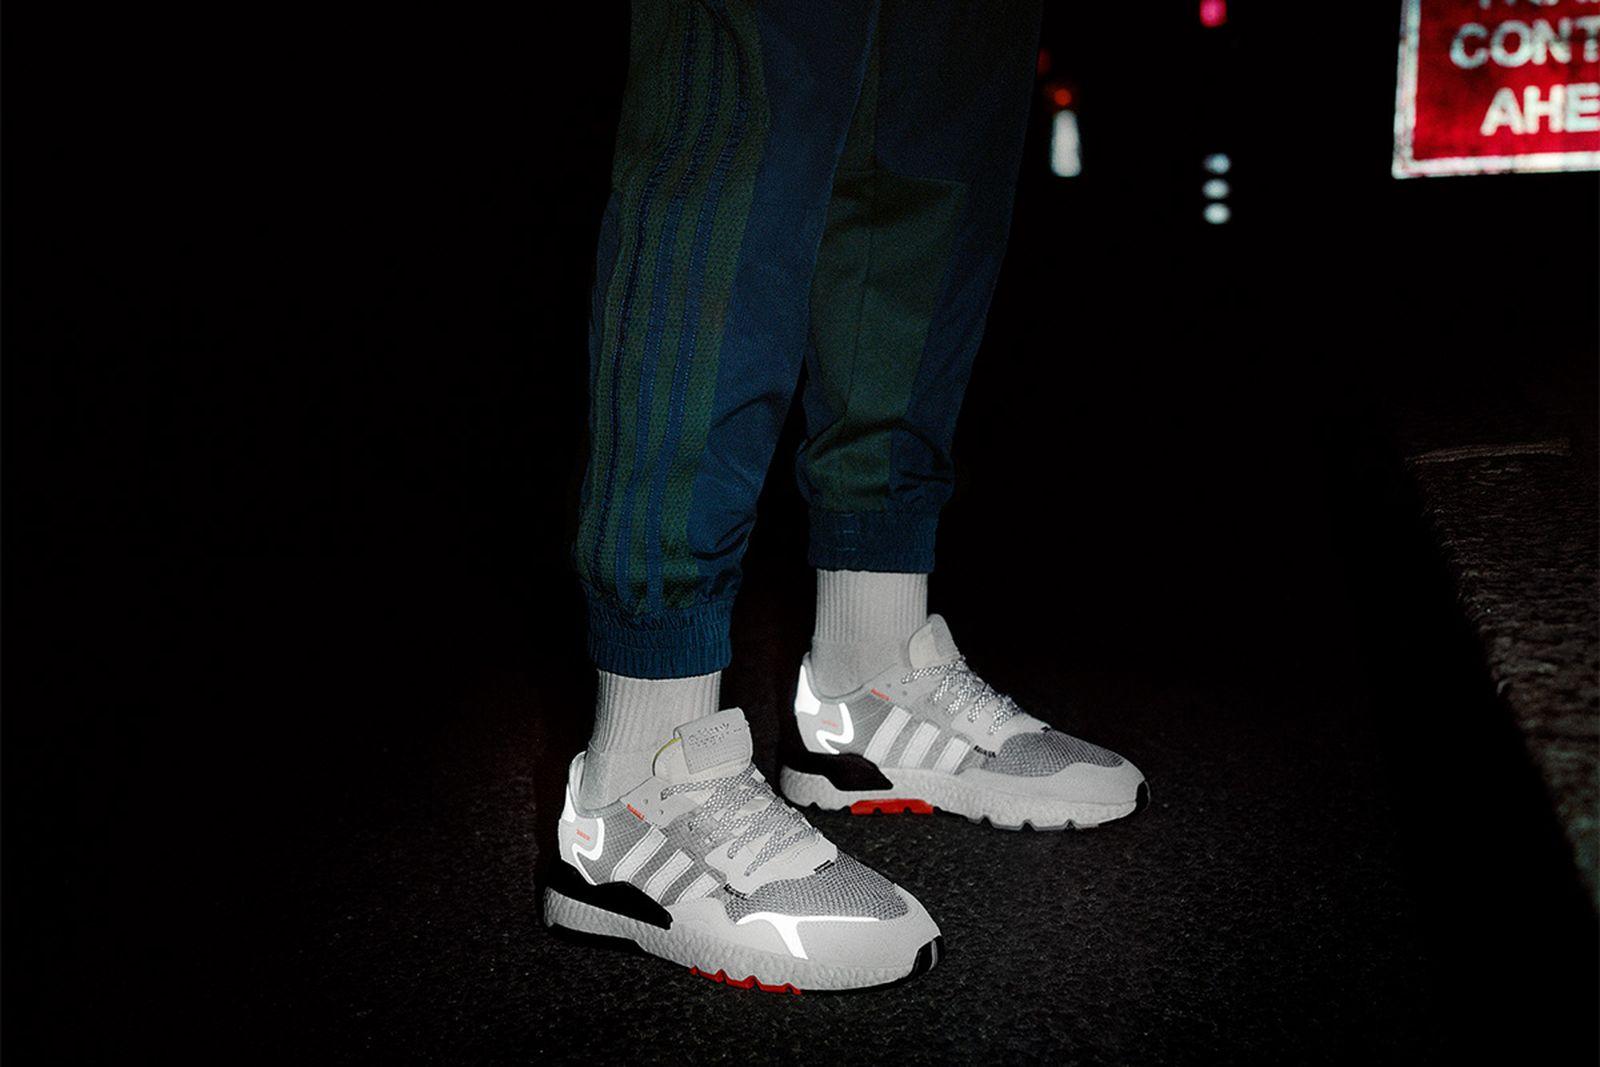 adidas nite jogger on after dark adidas Originals